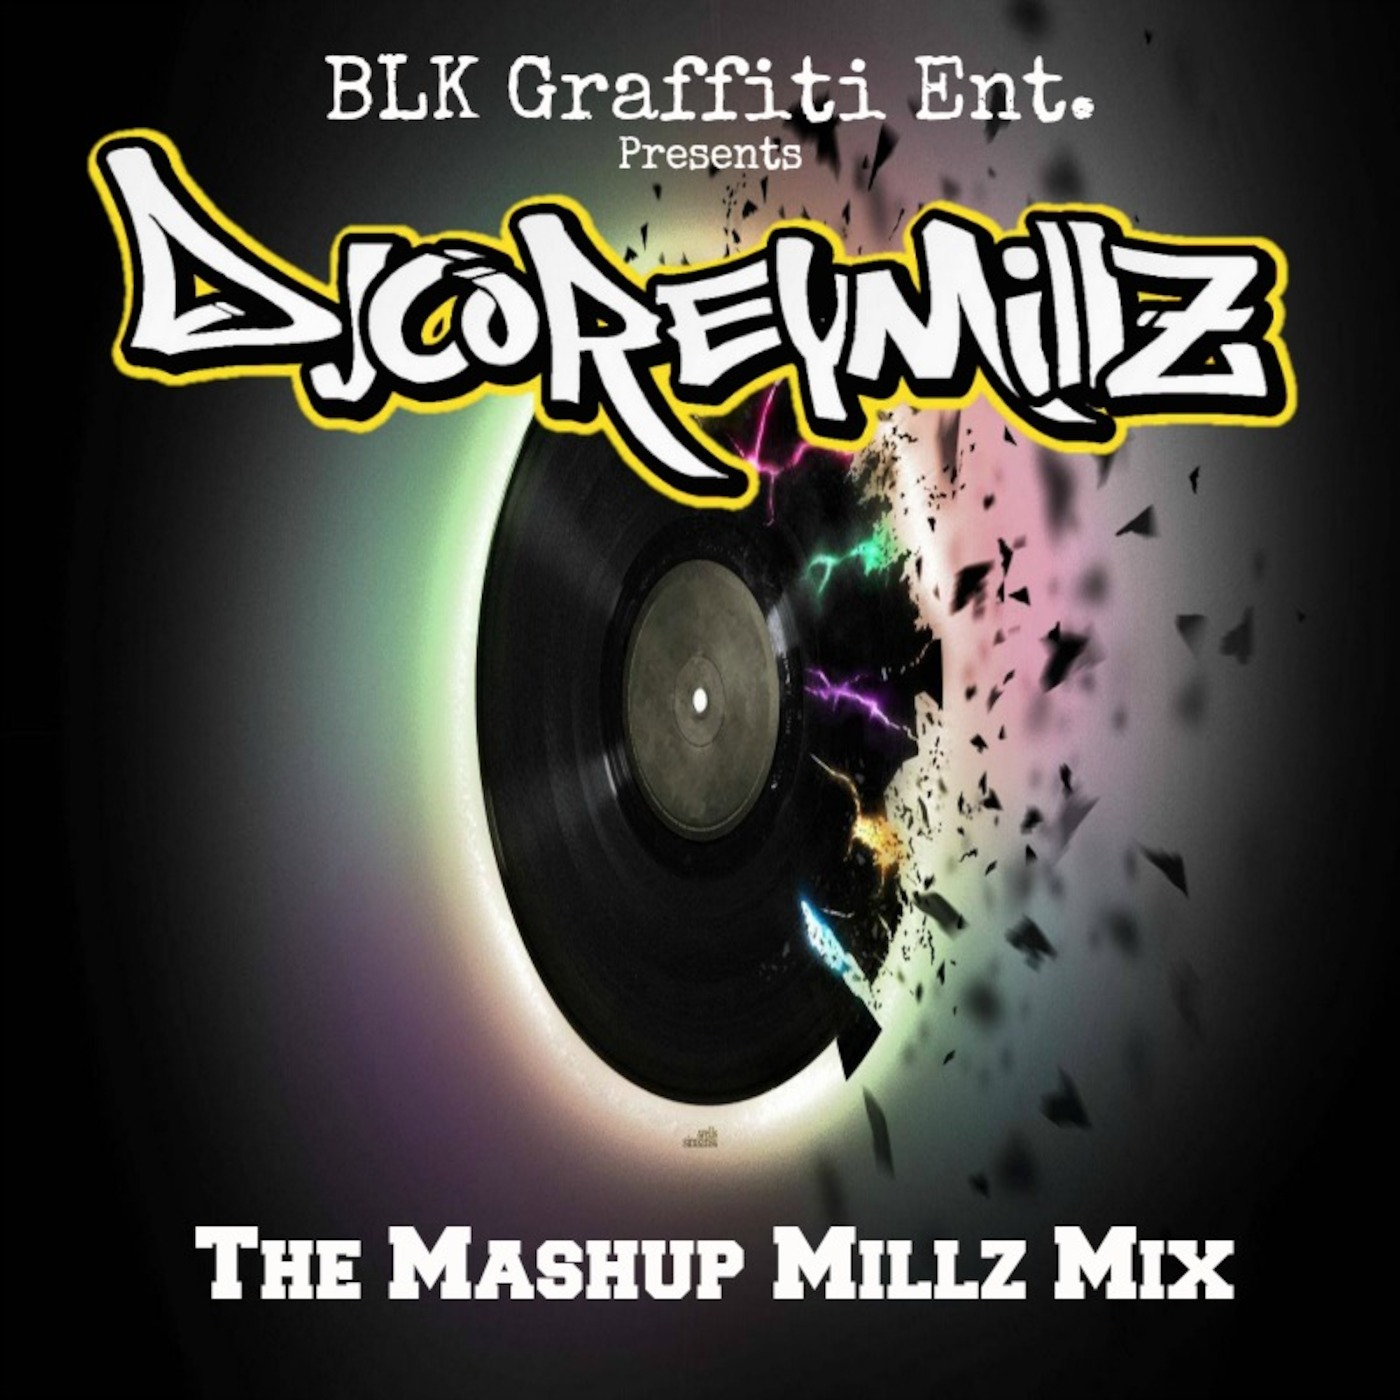 The Mashup Millz Mix The Millz Mix podcast